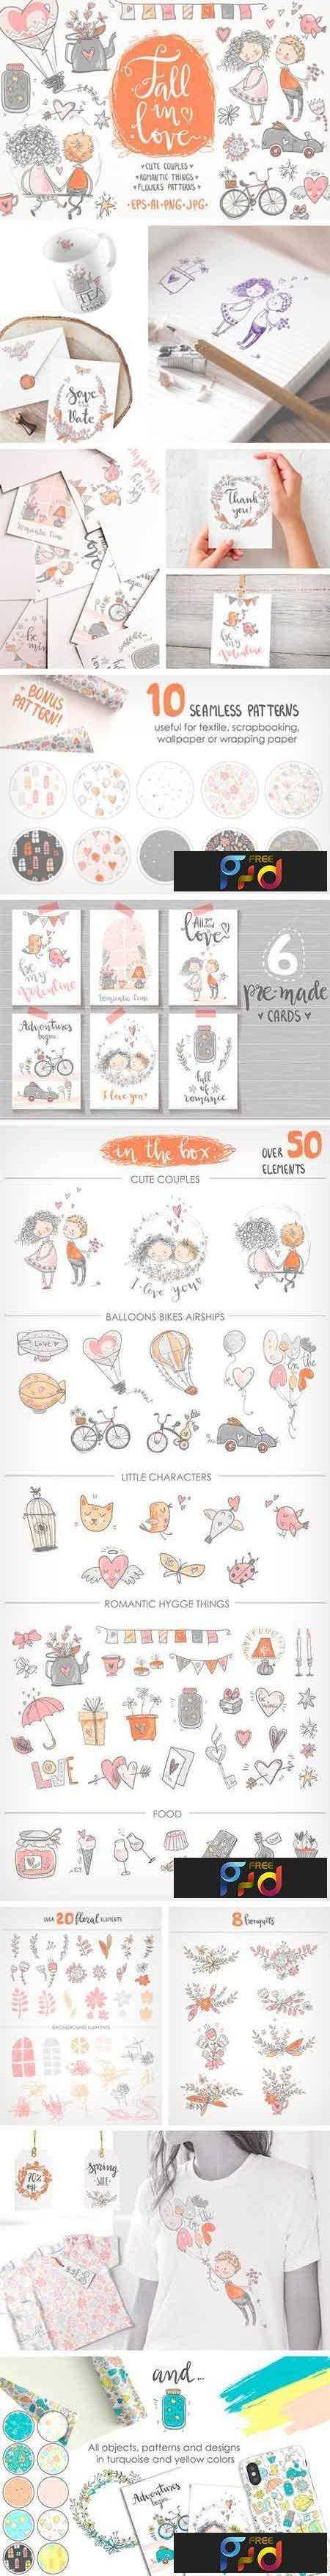 1805069 Fall in Love, ROMANTIC Graphic KIT 2271457 1